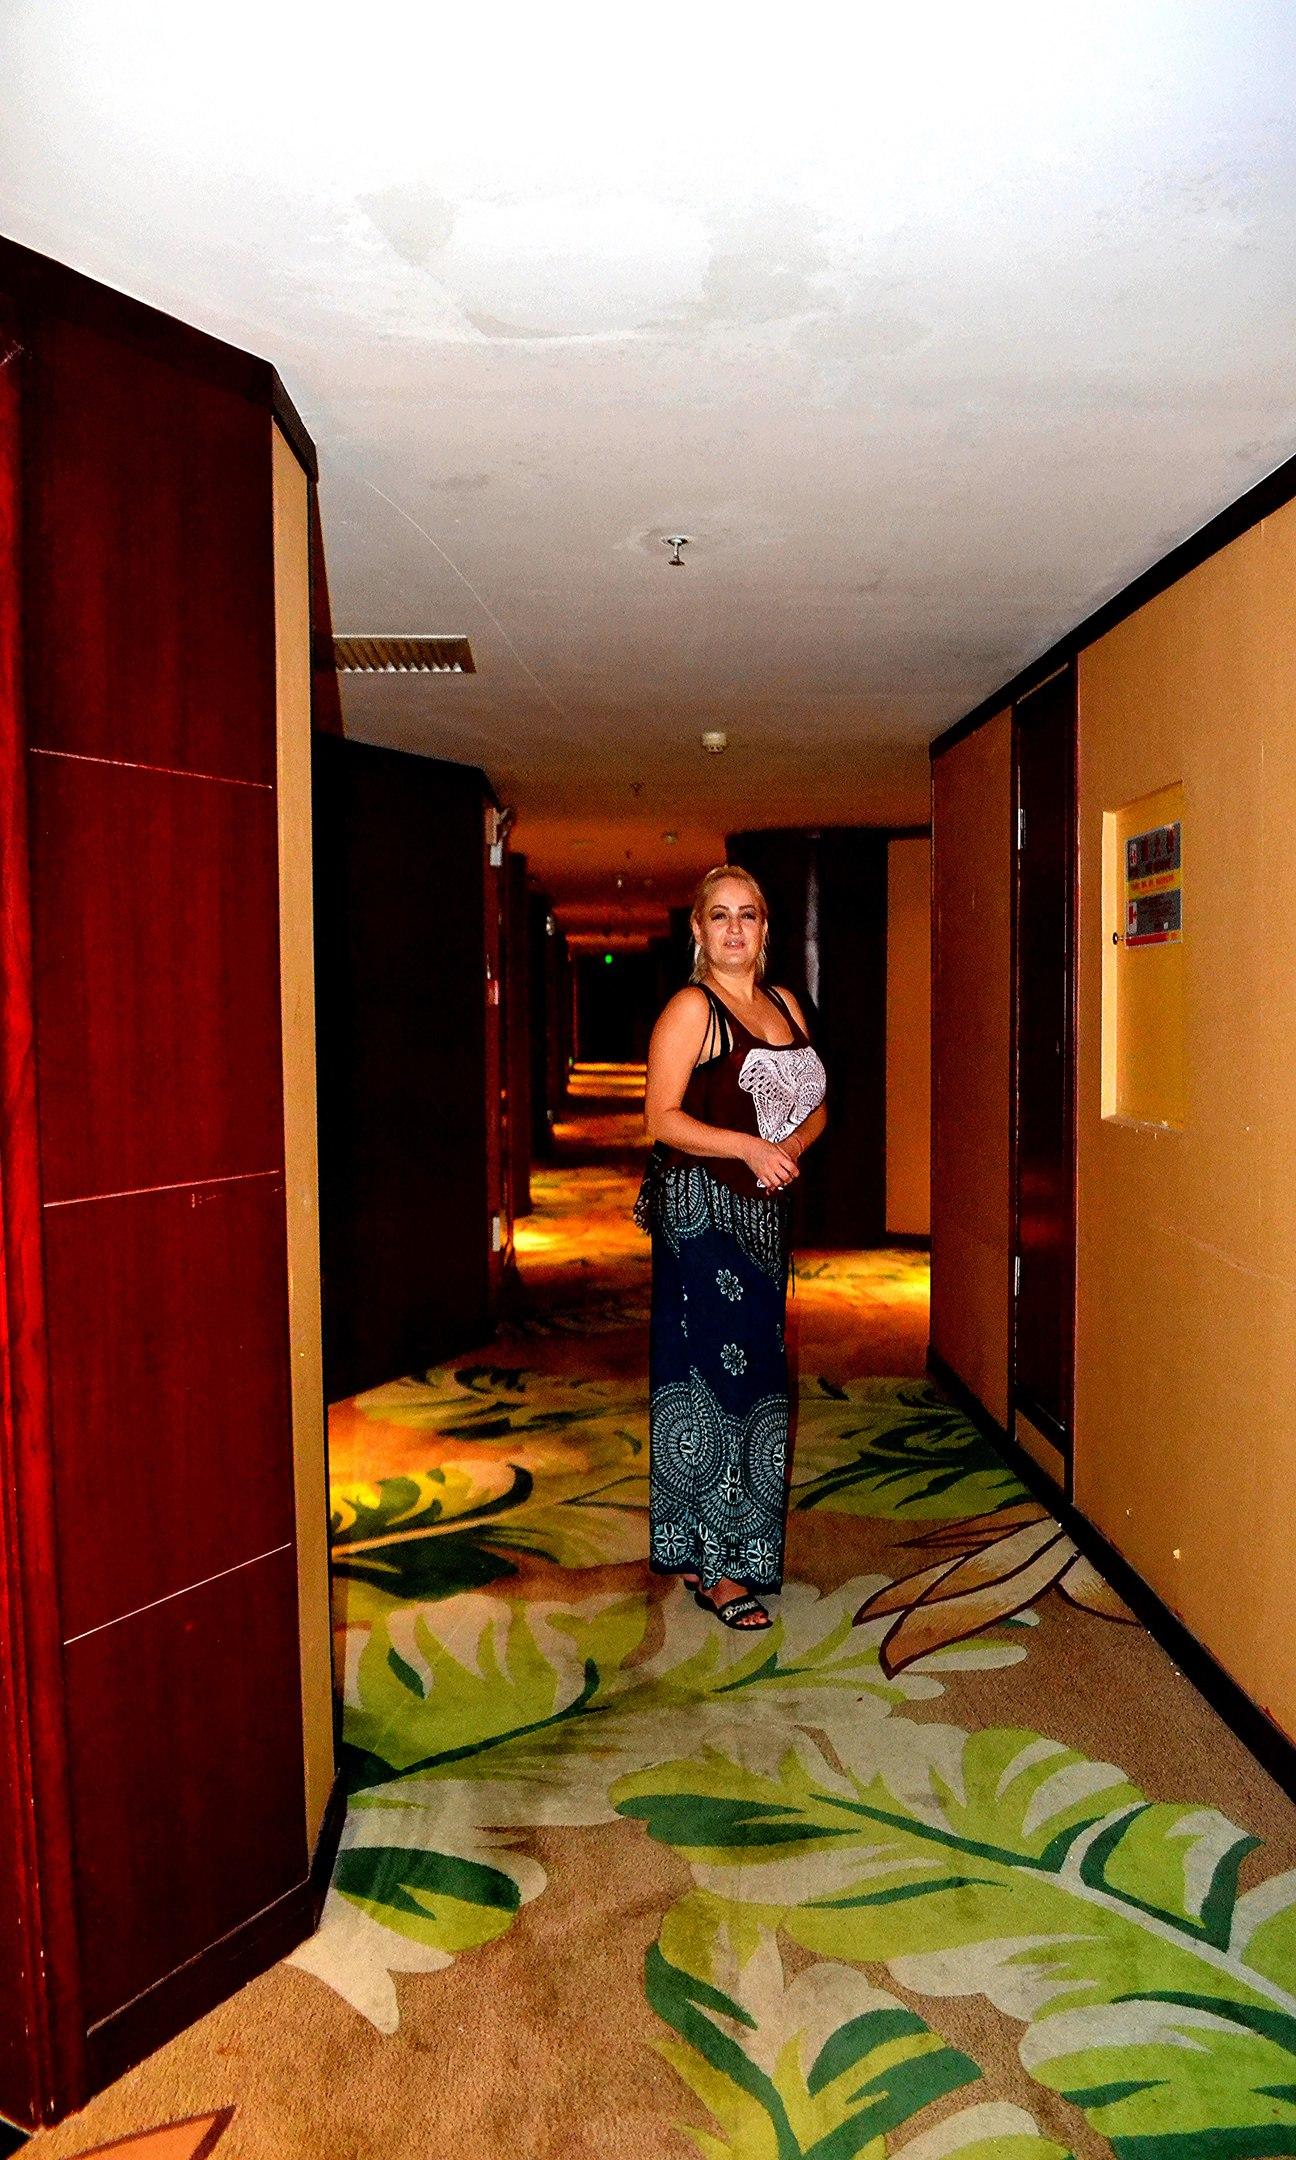 Елена Руденко (Валтея). Китай, о.Хайнань, г.Санья. (фото) - Страница 3 8YYmAe3AVh4